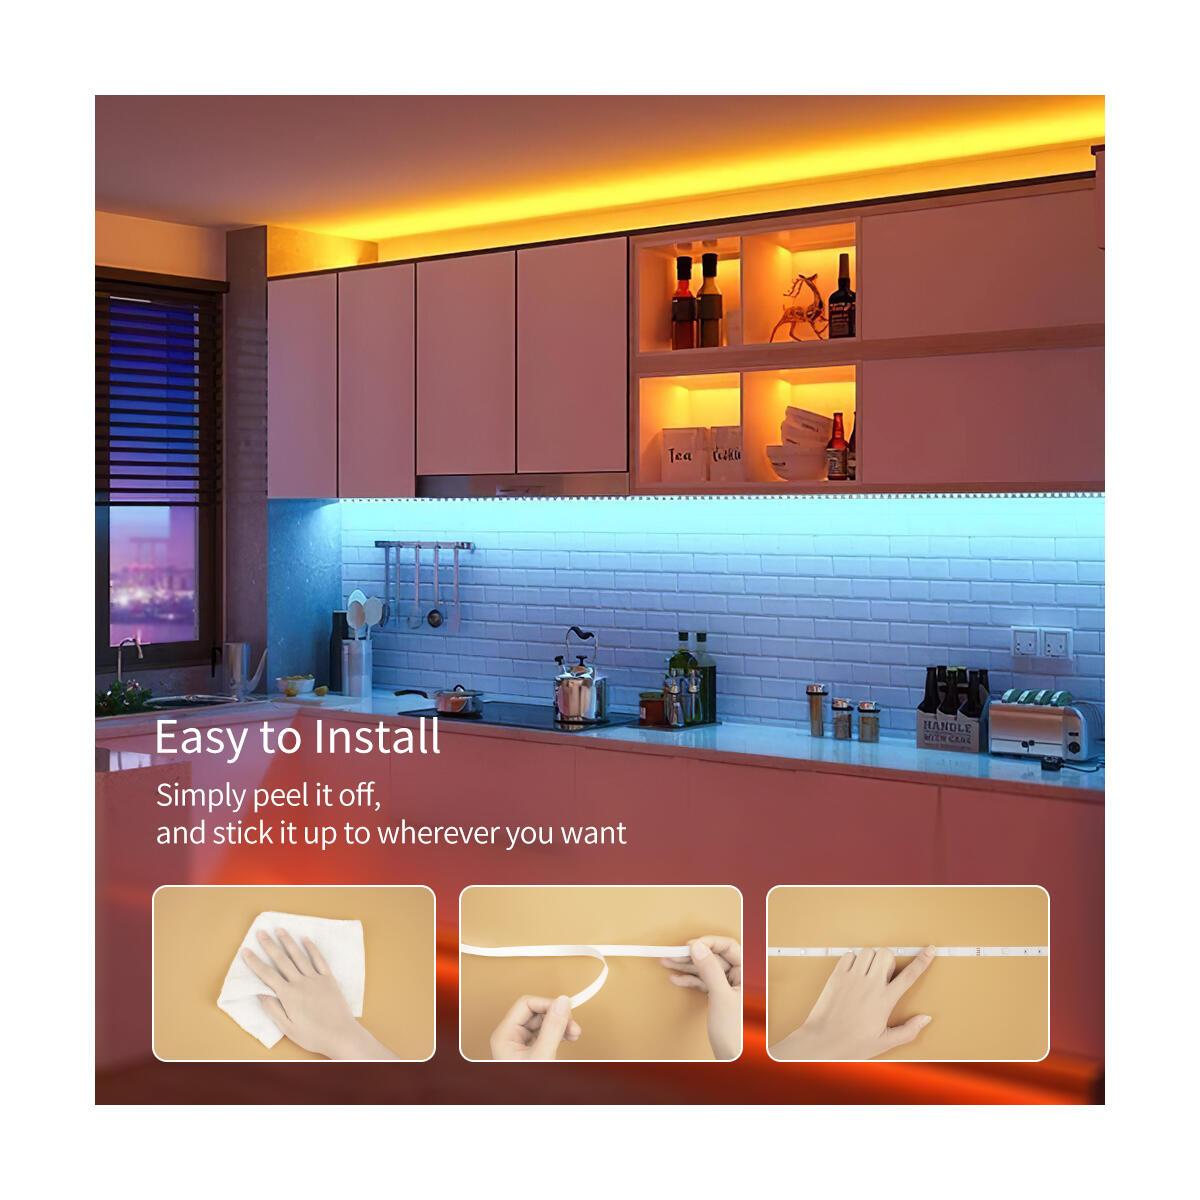 LED Strip Lights 32.8ft, GUPUP LED Lights for Bedroom SMD 5050 12V, LED Lights RGB Color Changing LED Lights Strip with Remote for Kitchen, Room, Ceiling, Party, Home Decoration, Non-Waterproof